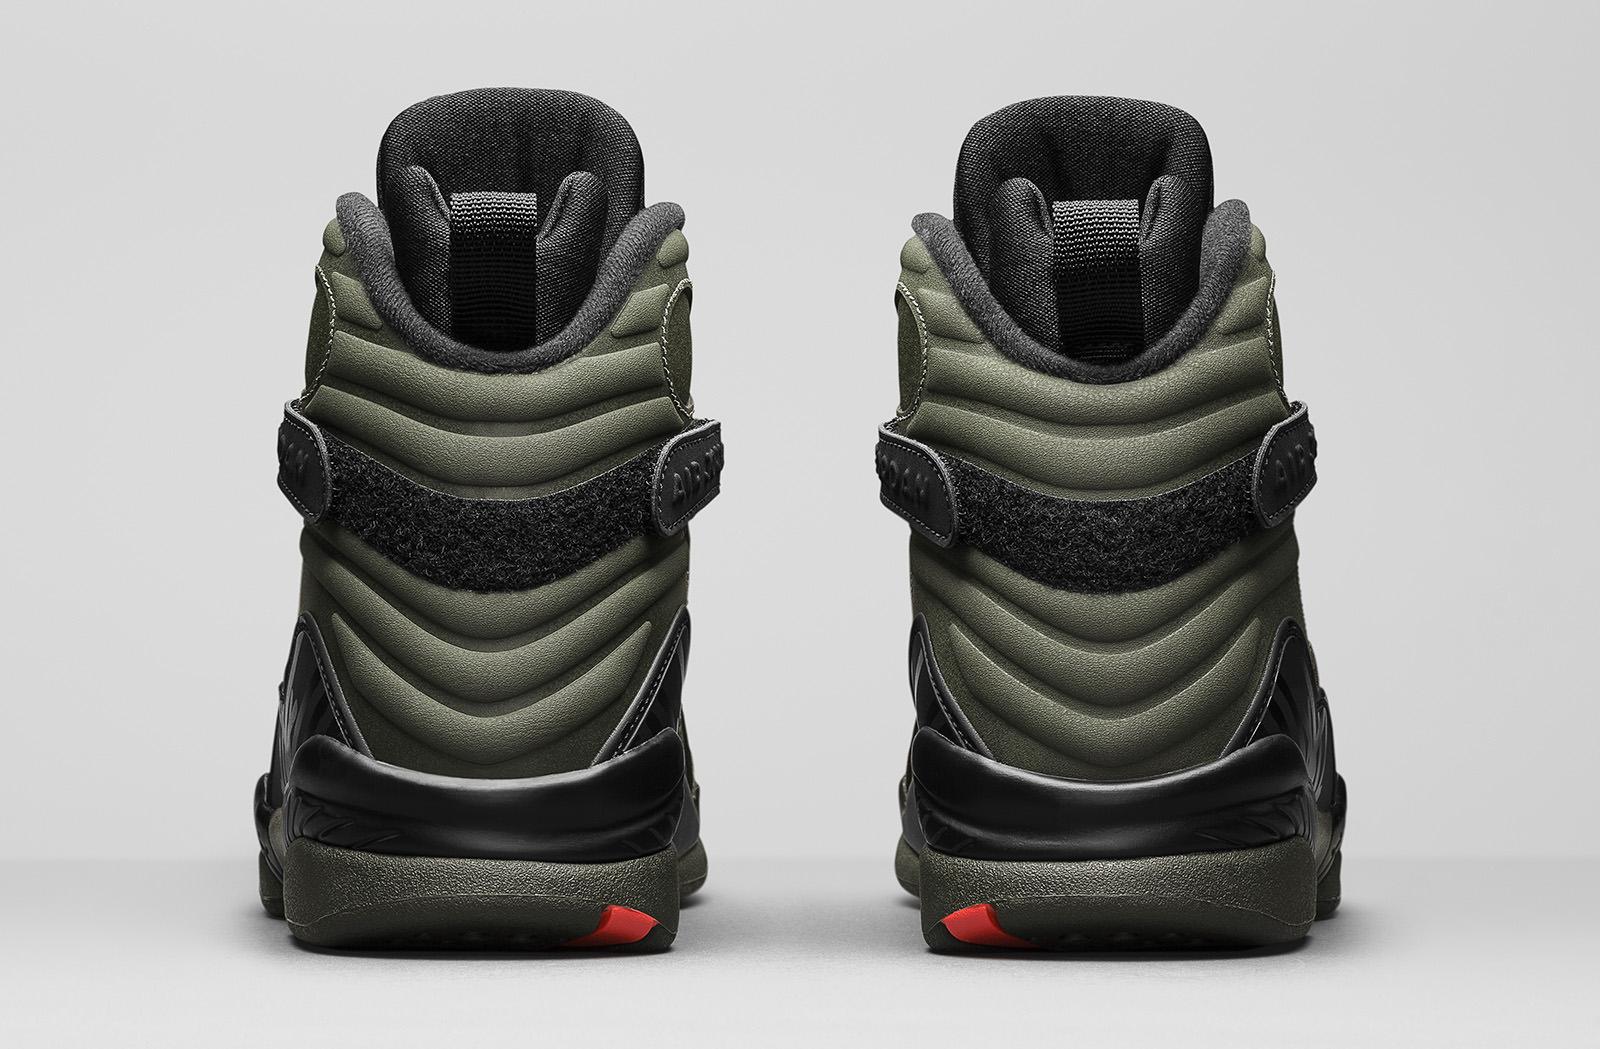 305381-305_a5_pair_heels_original